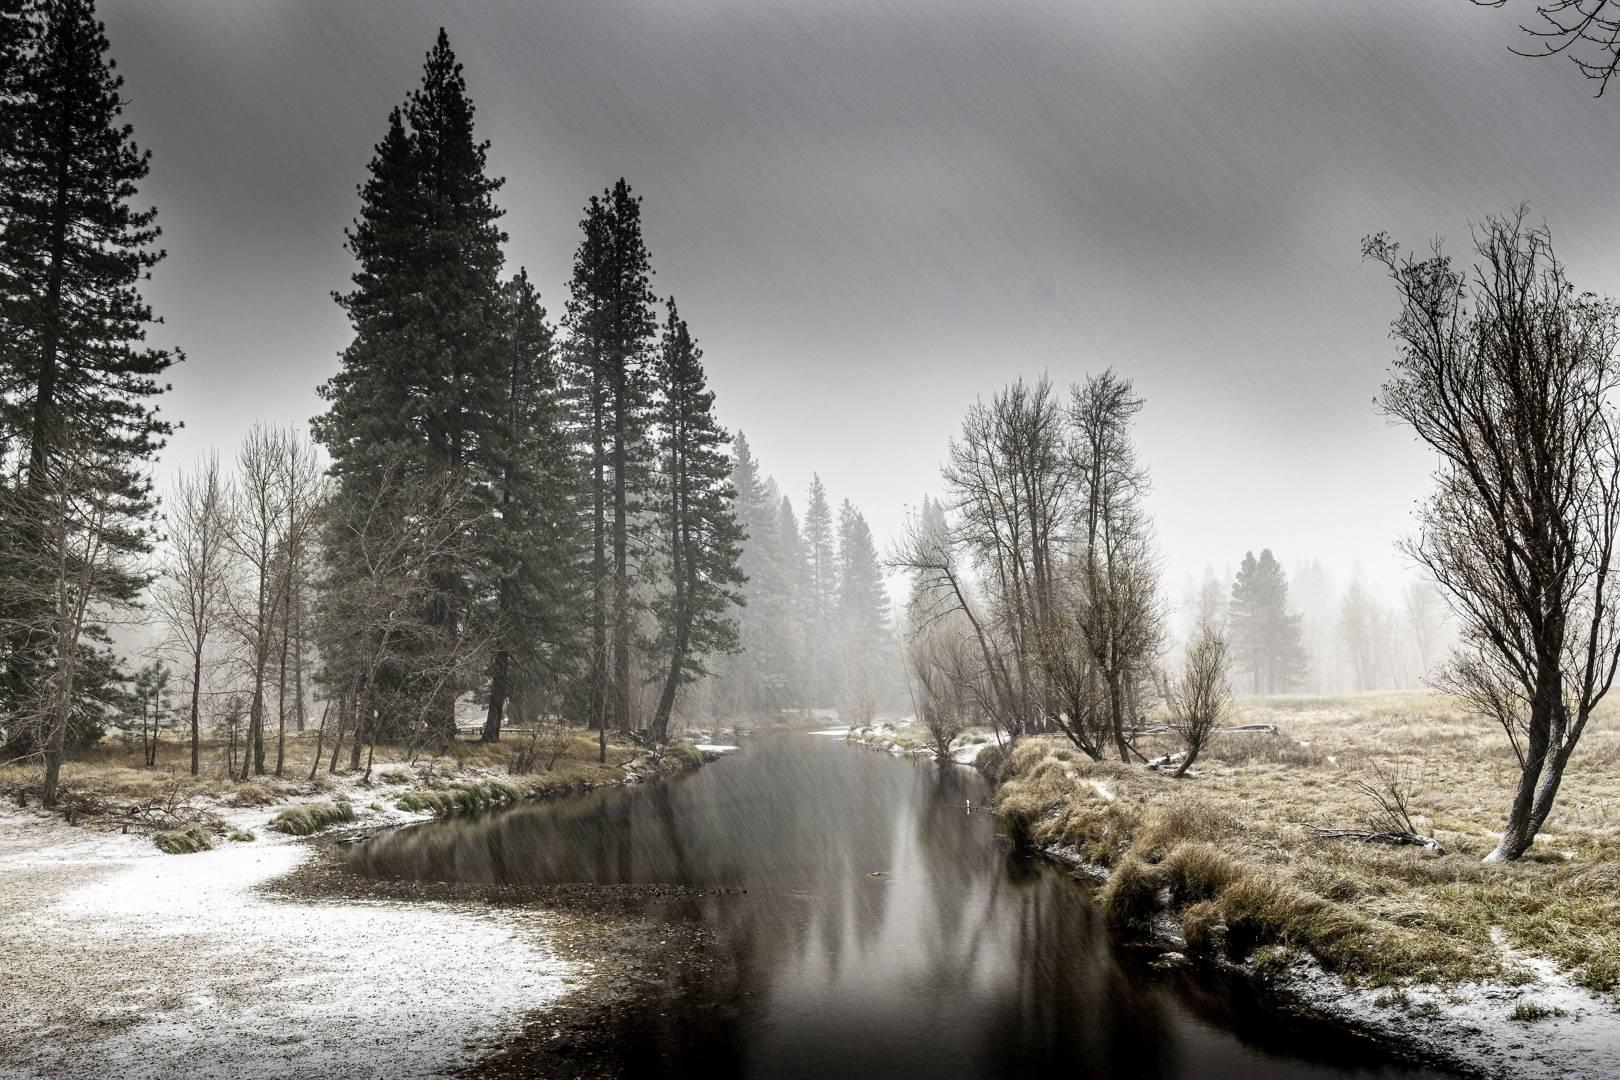 The last colour image, as in my opinion monochrome in Yosemite